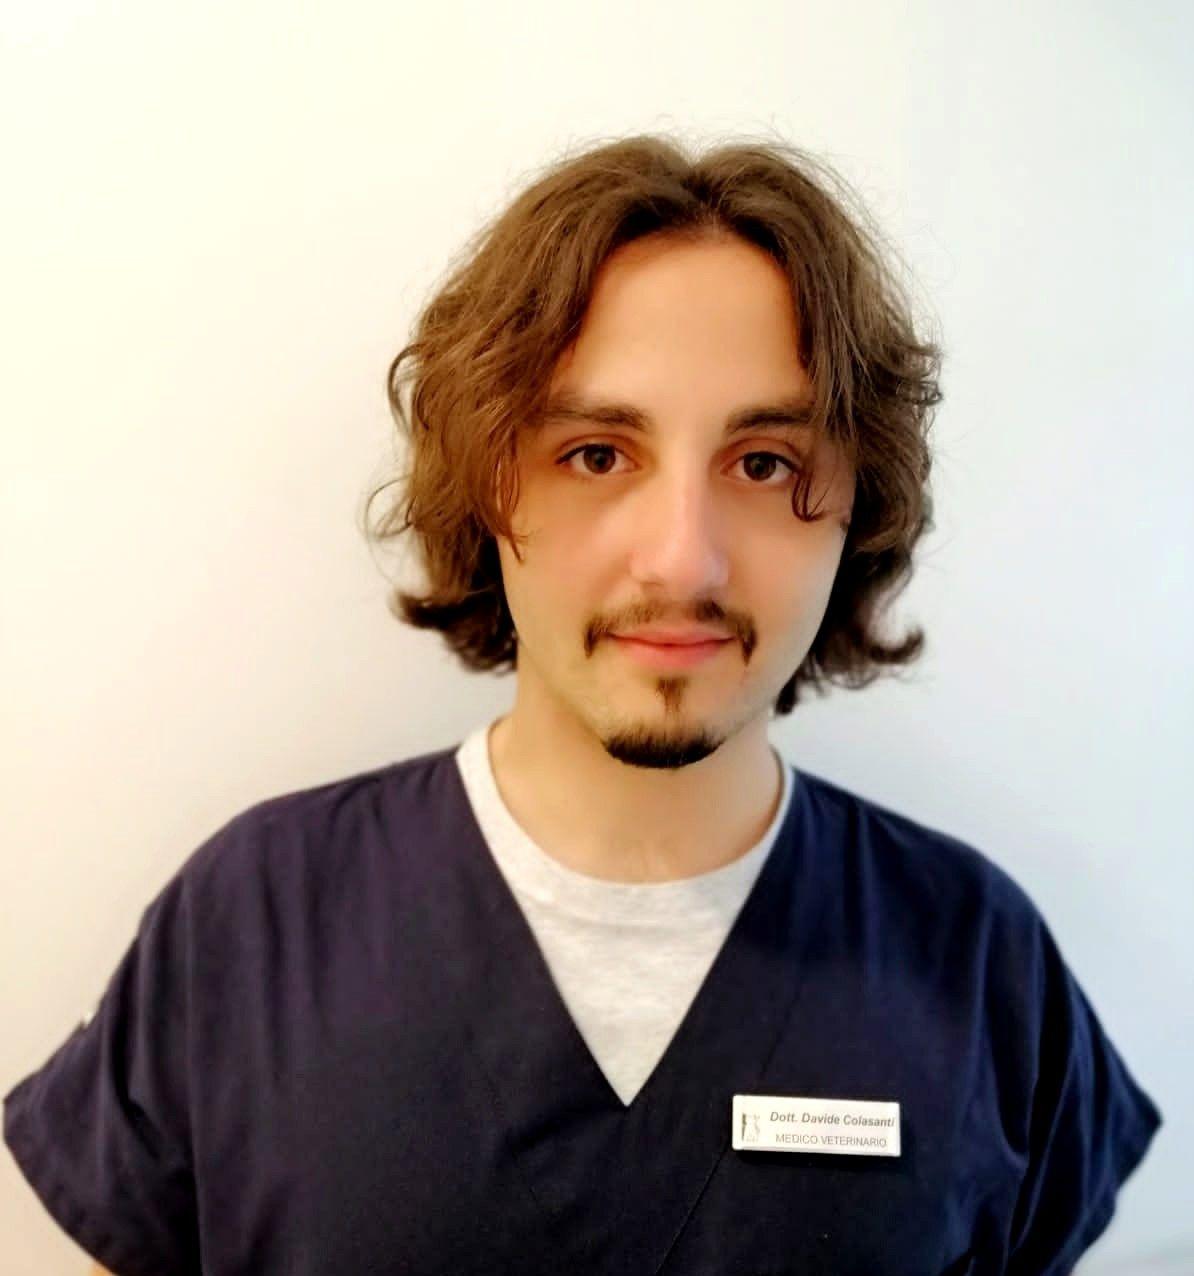 Davide Colasanti